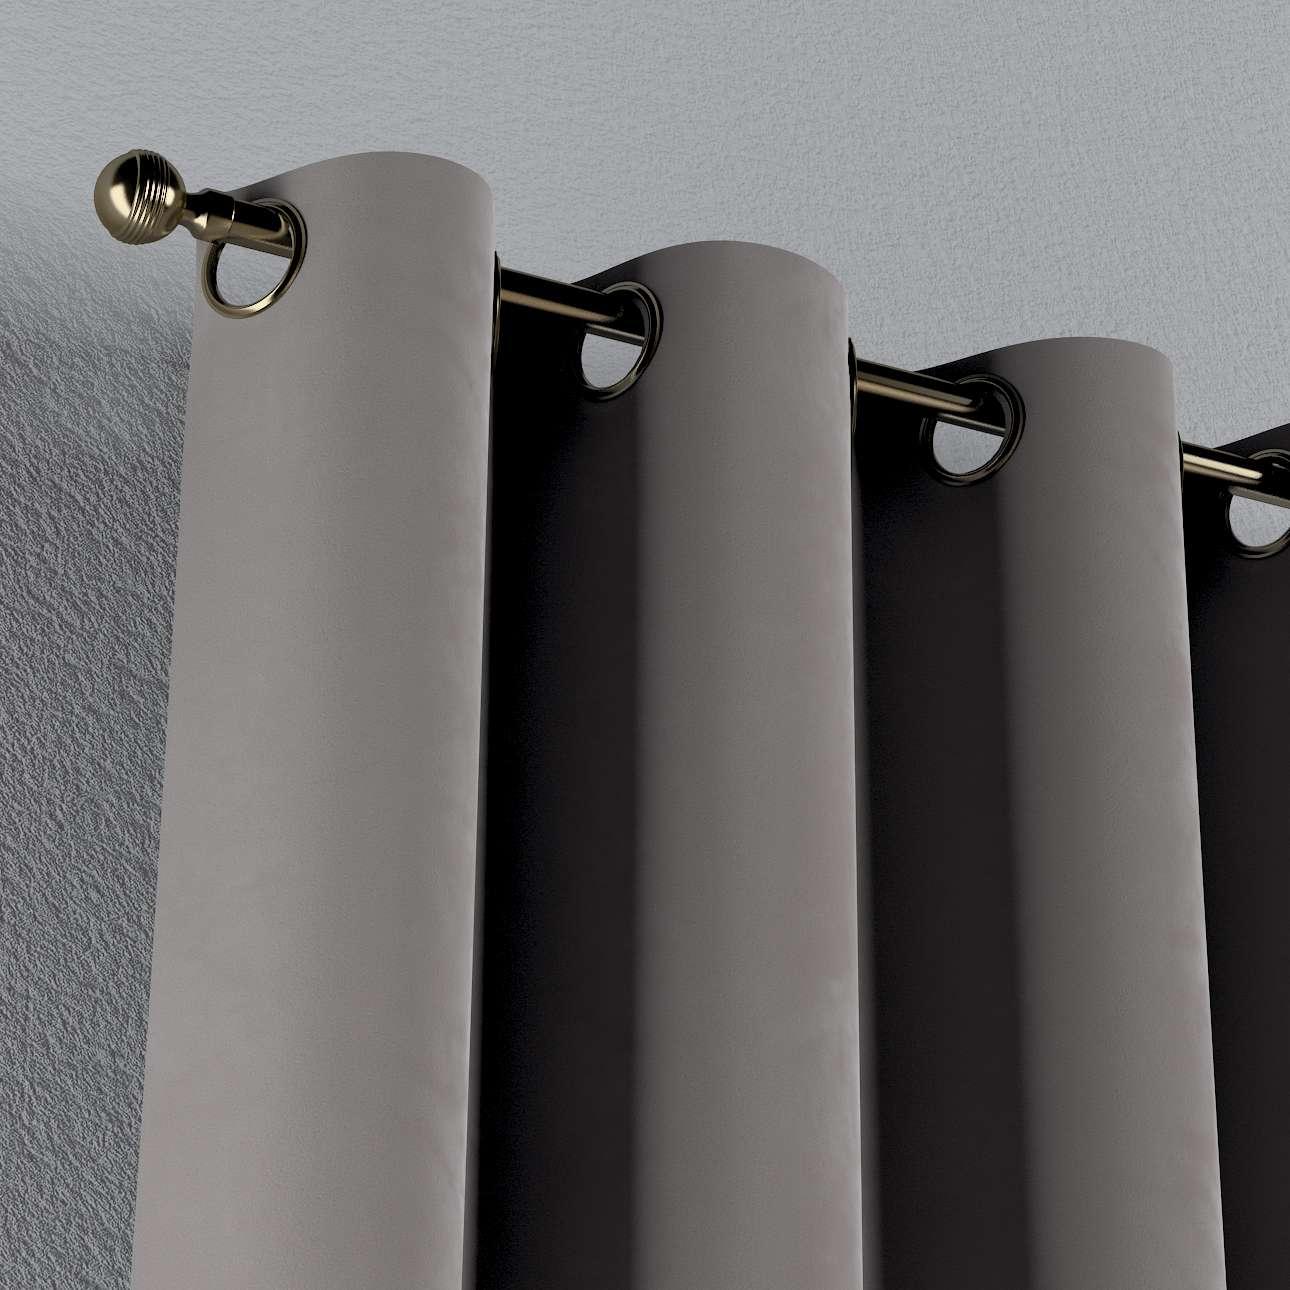 Zasłona na kółkach 1 szt. w kolekcji Velvet, tkanina: 704-11